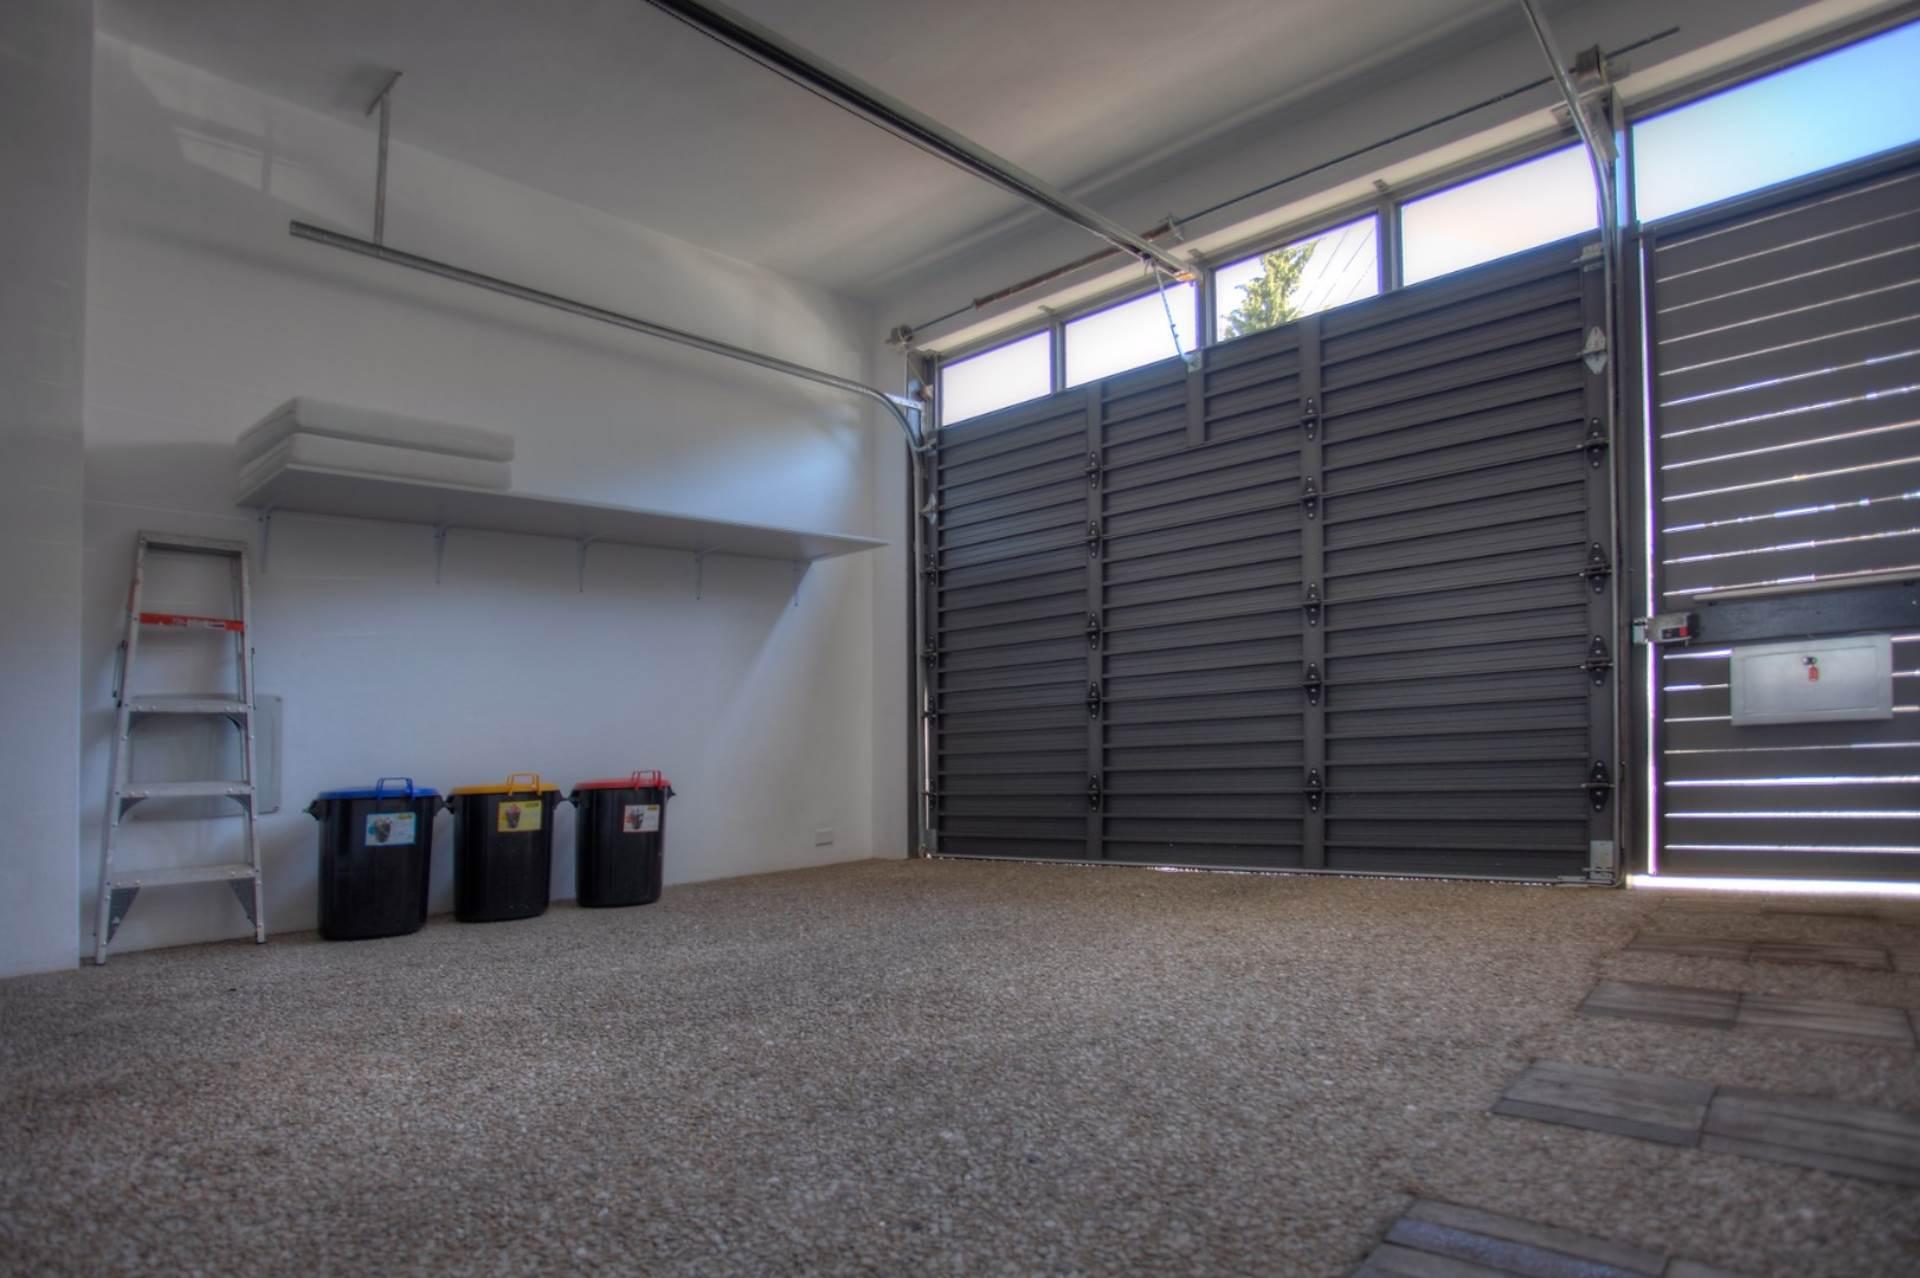 De Waterkant property for sale. Ref No: 13533994. Picture no 35